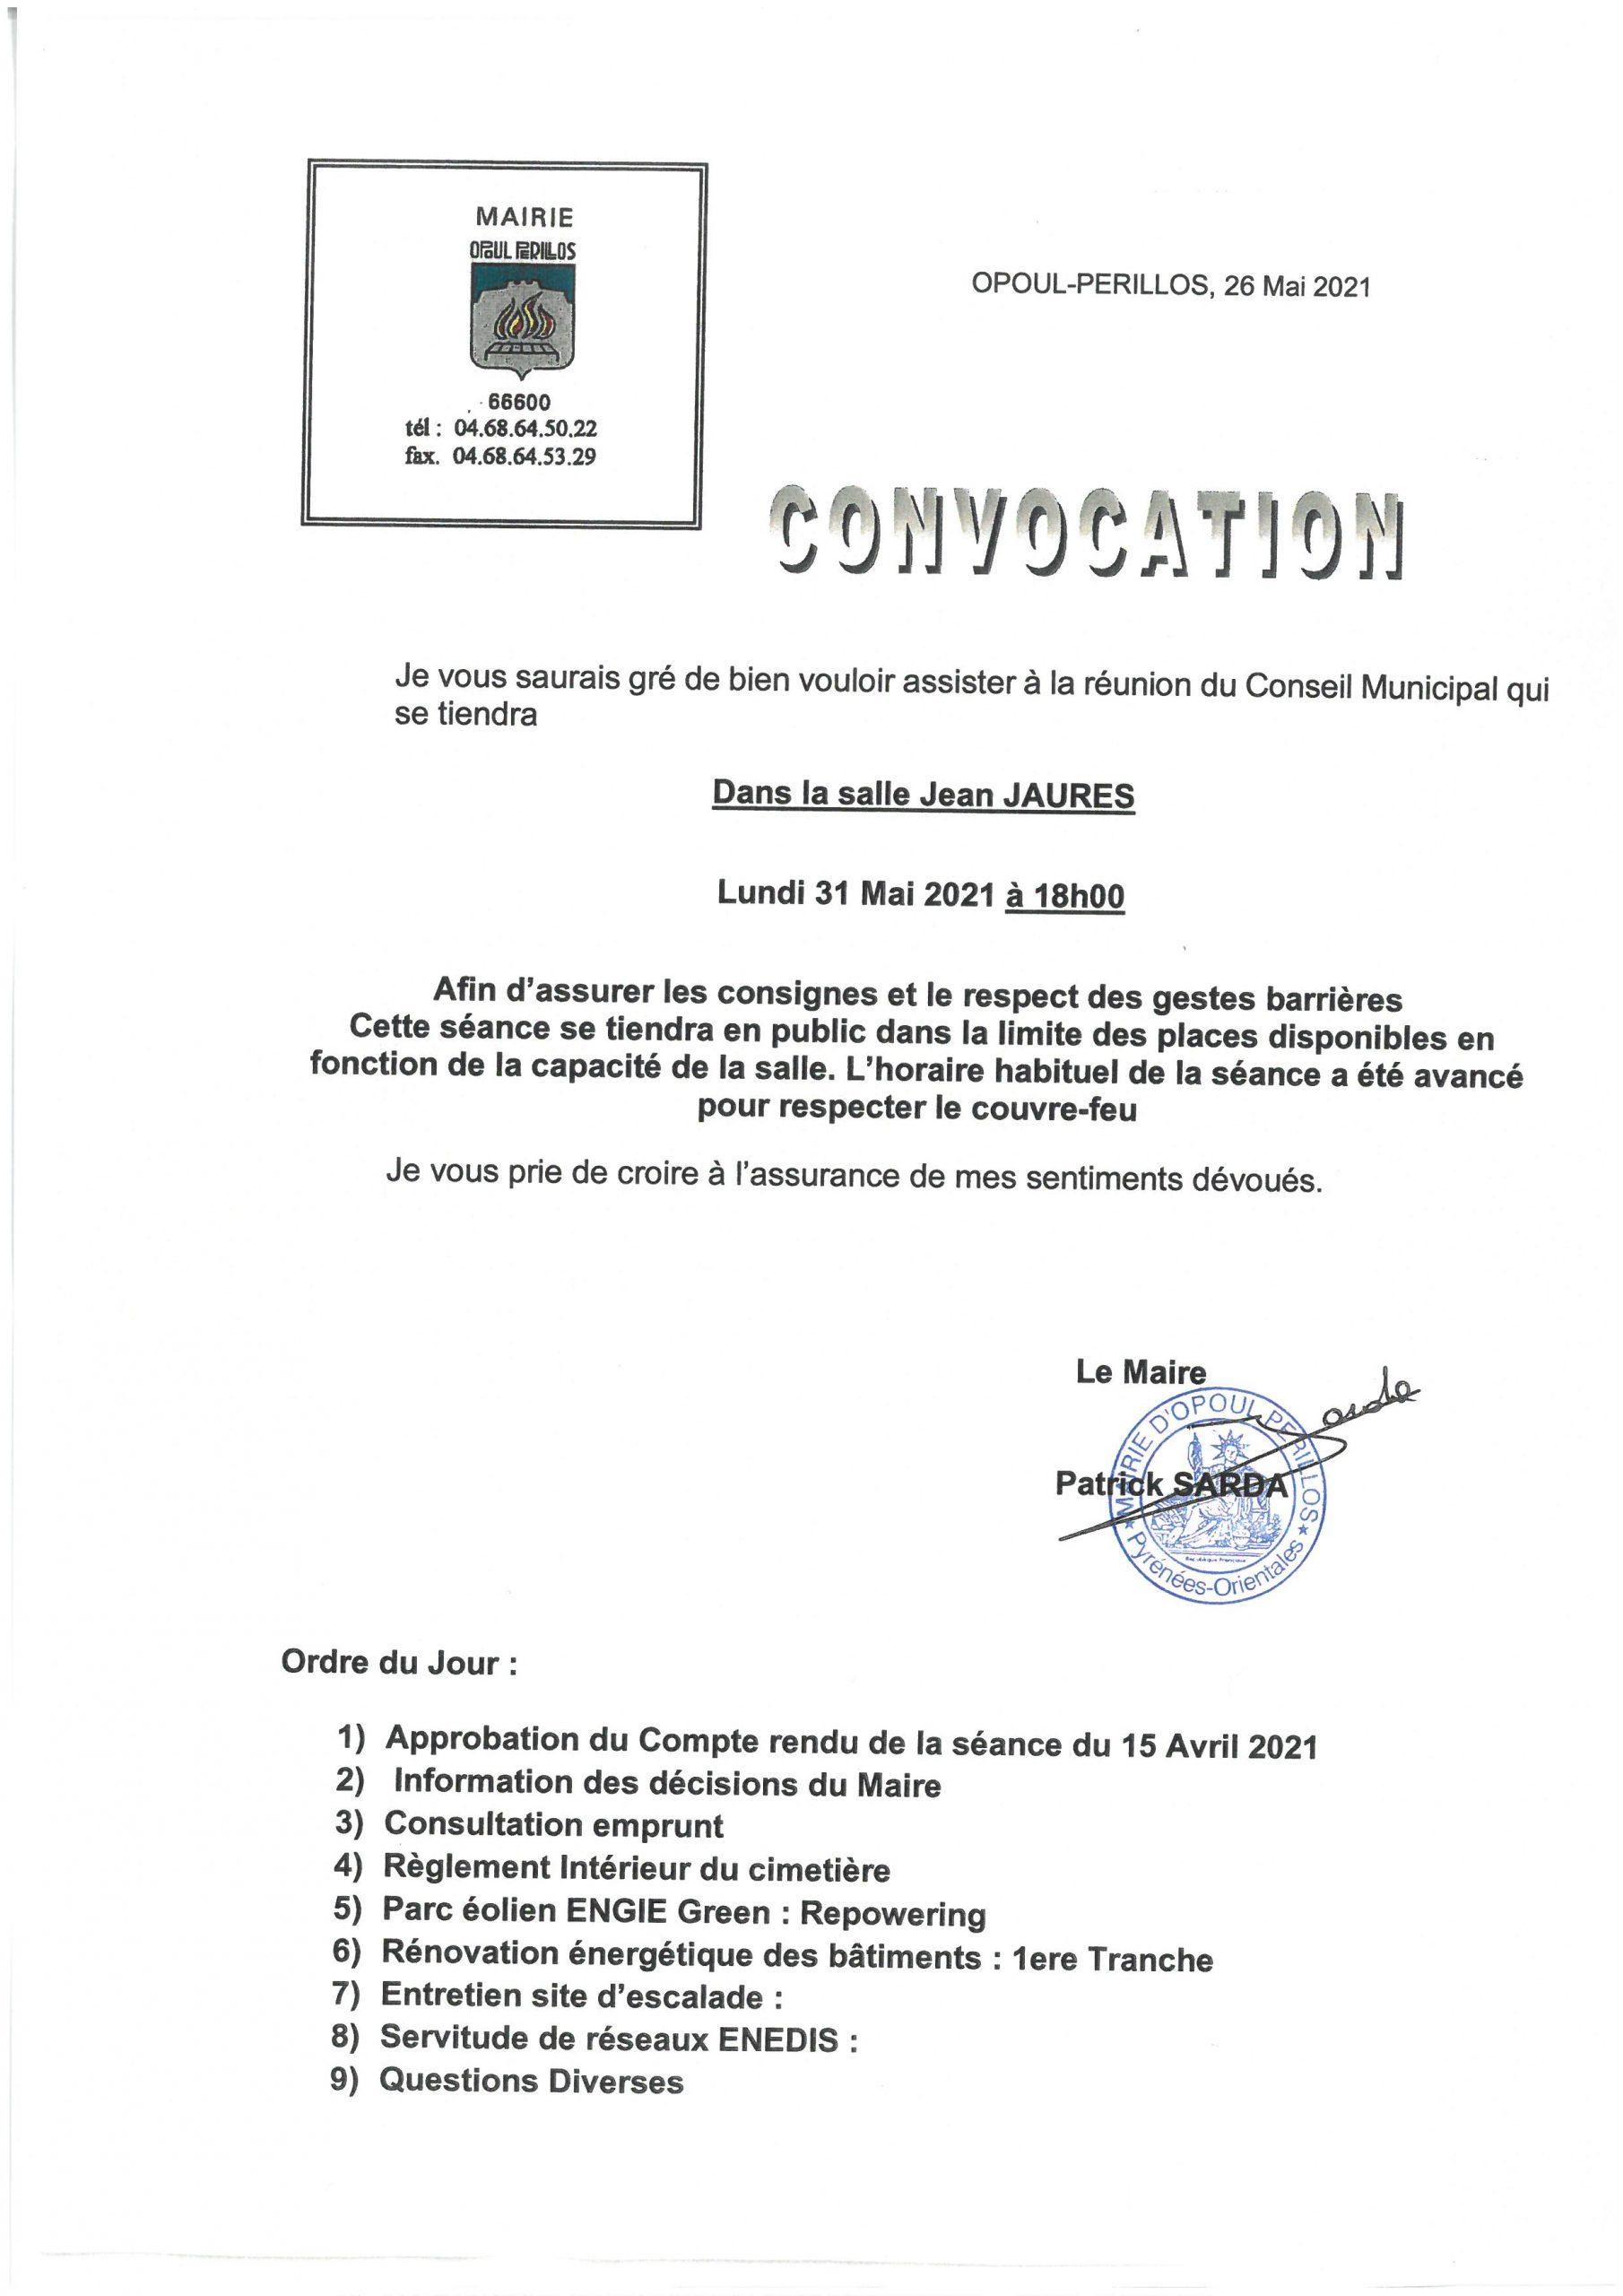 Convocation conseil municipal du 31 mai 2021